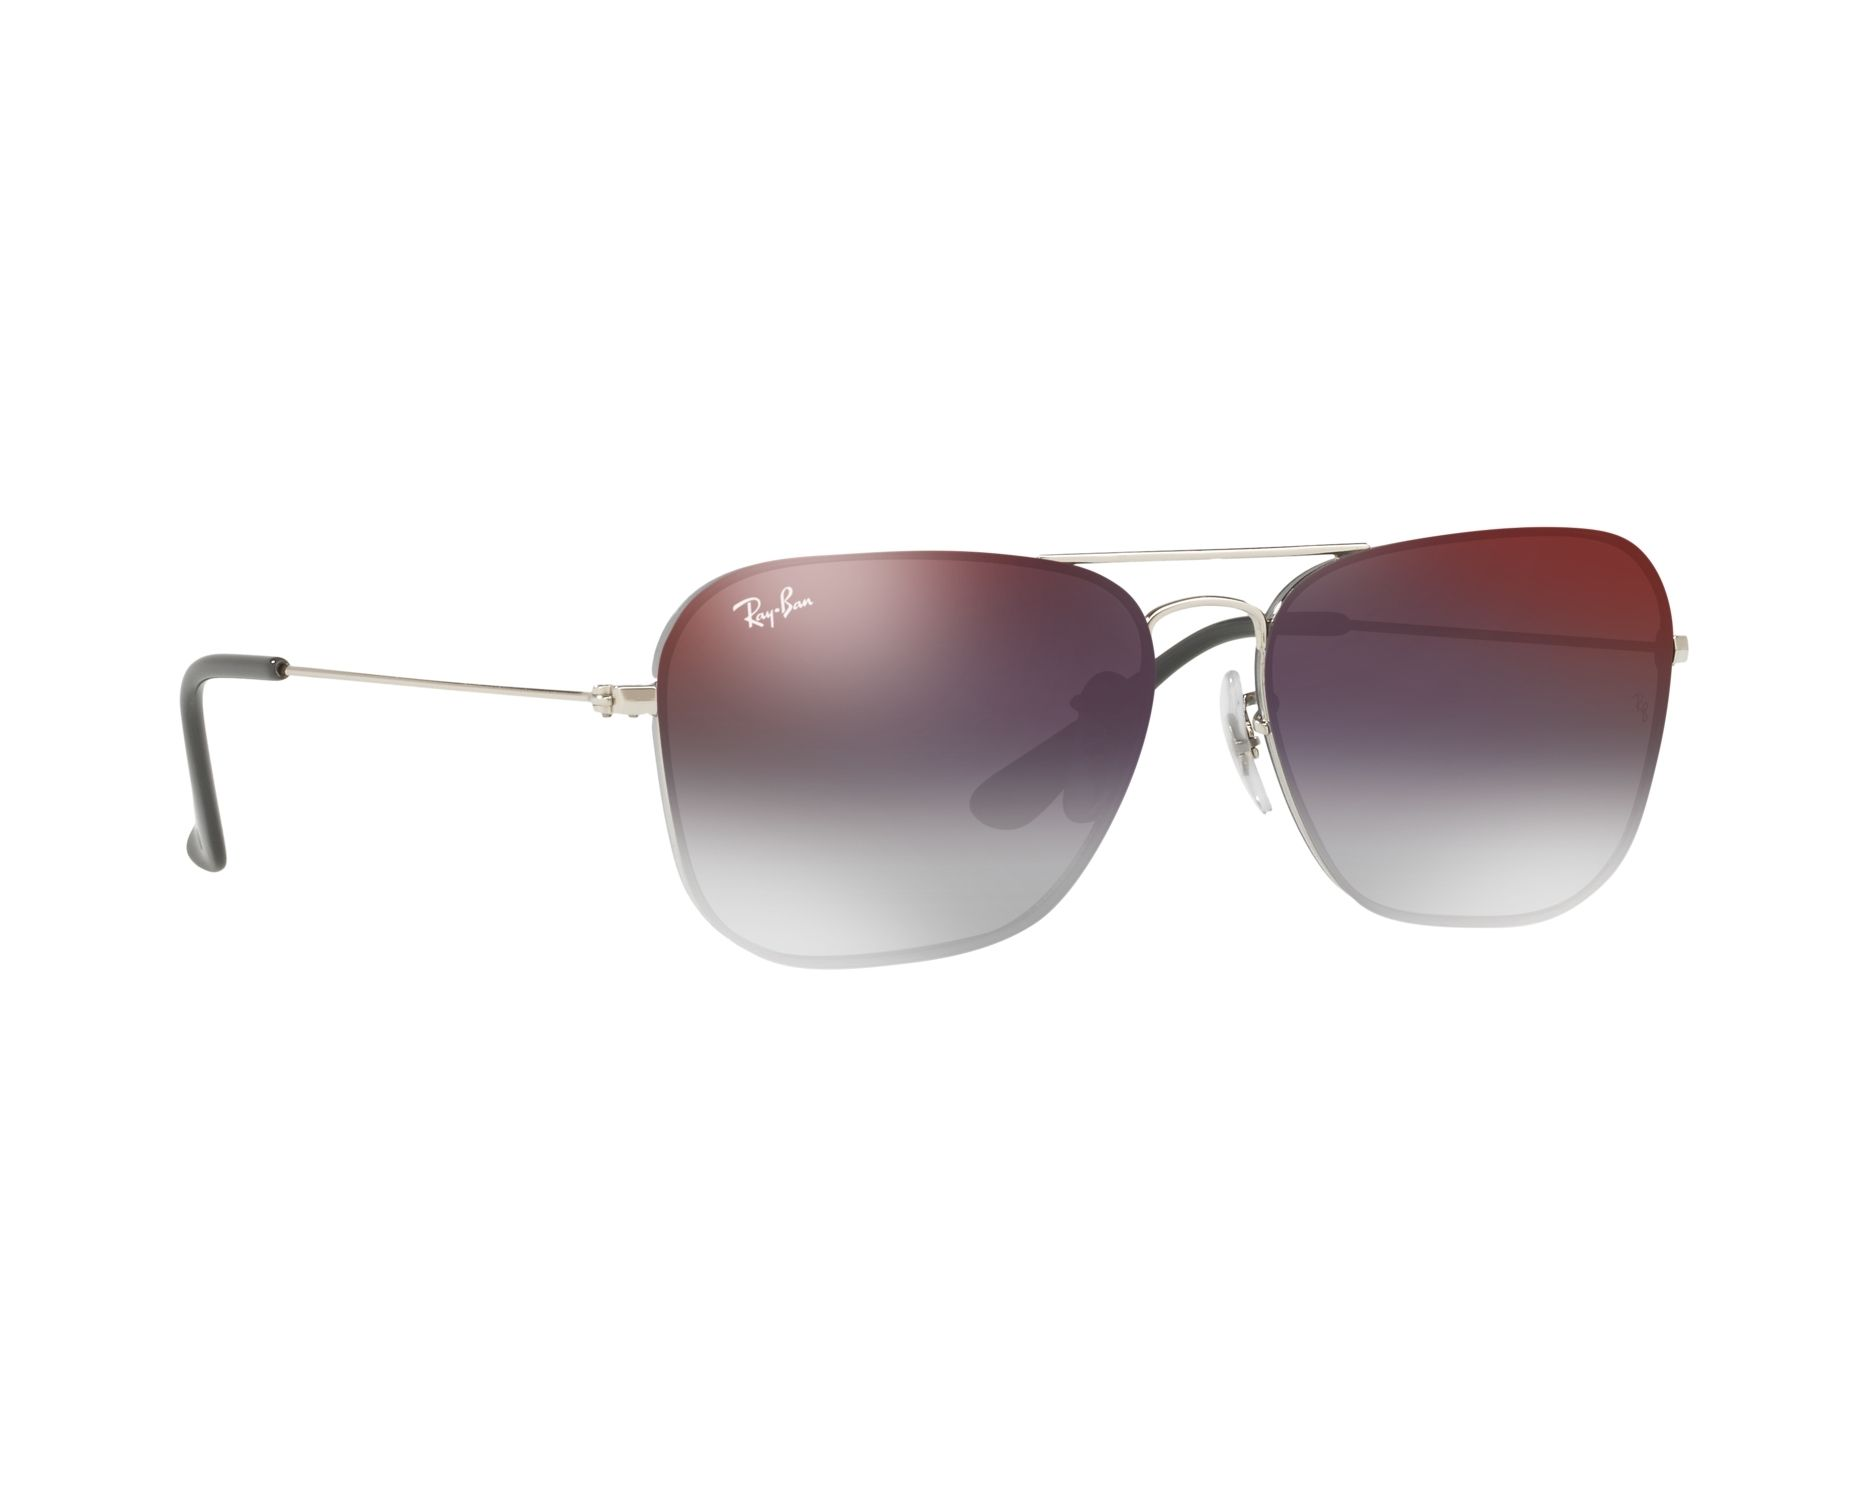 Buy Ray-Ban Sunglasses RB-3603 003 U0 Online - Visionet UK Ótica View  Armação de óculos RAY BAN RB1556L 3603 49 161ed28fda